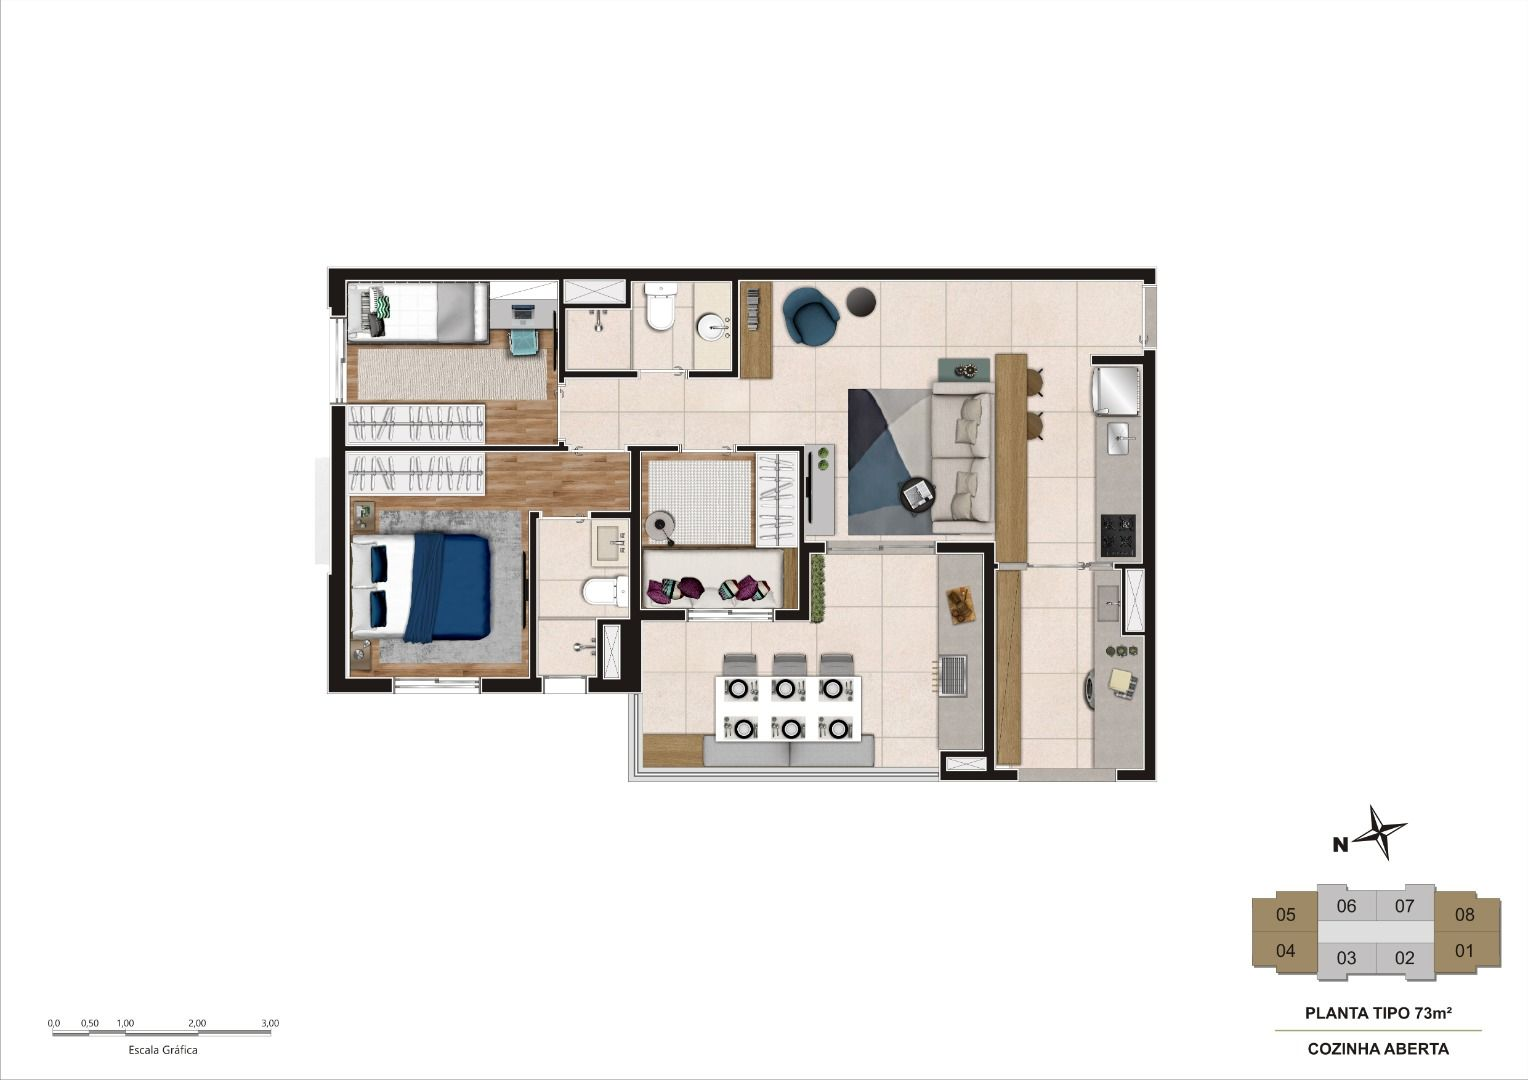 Planta do Reserva Tibagy Family Home. floorplan